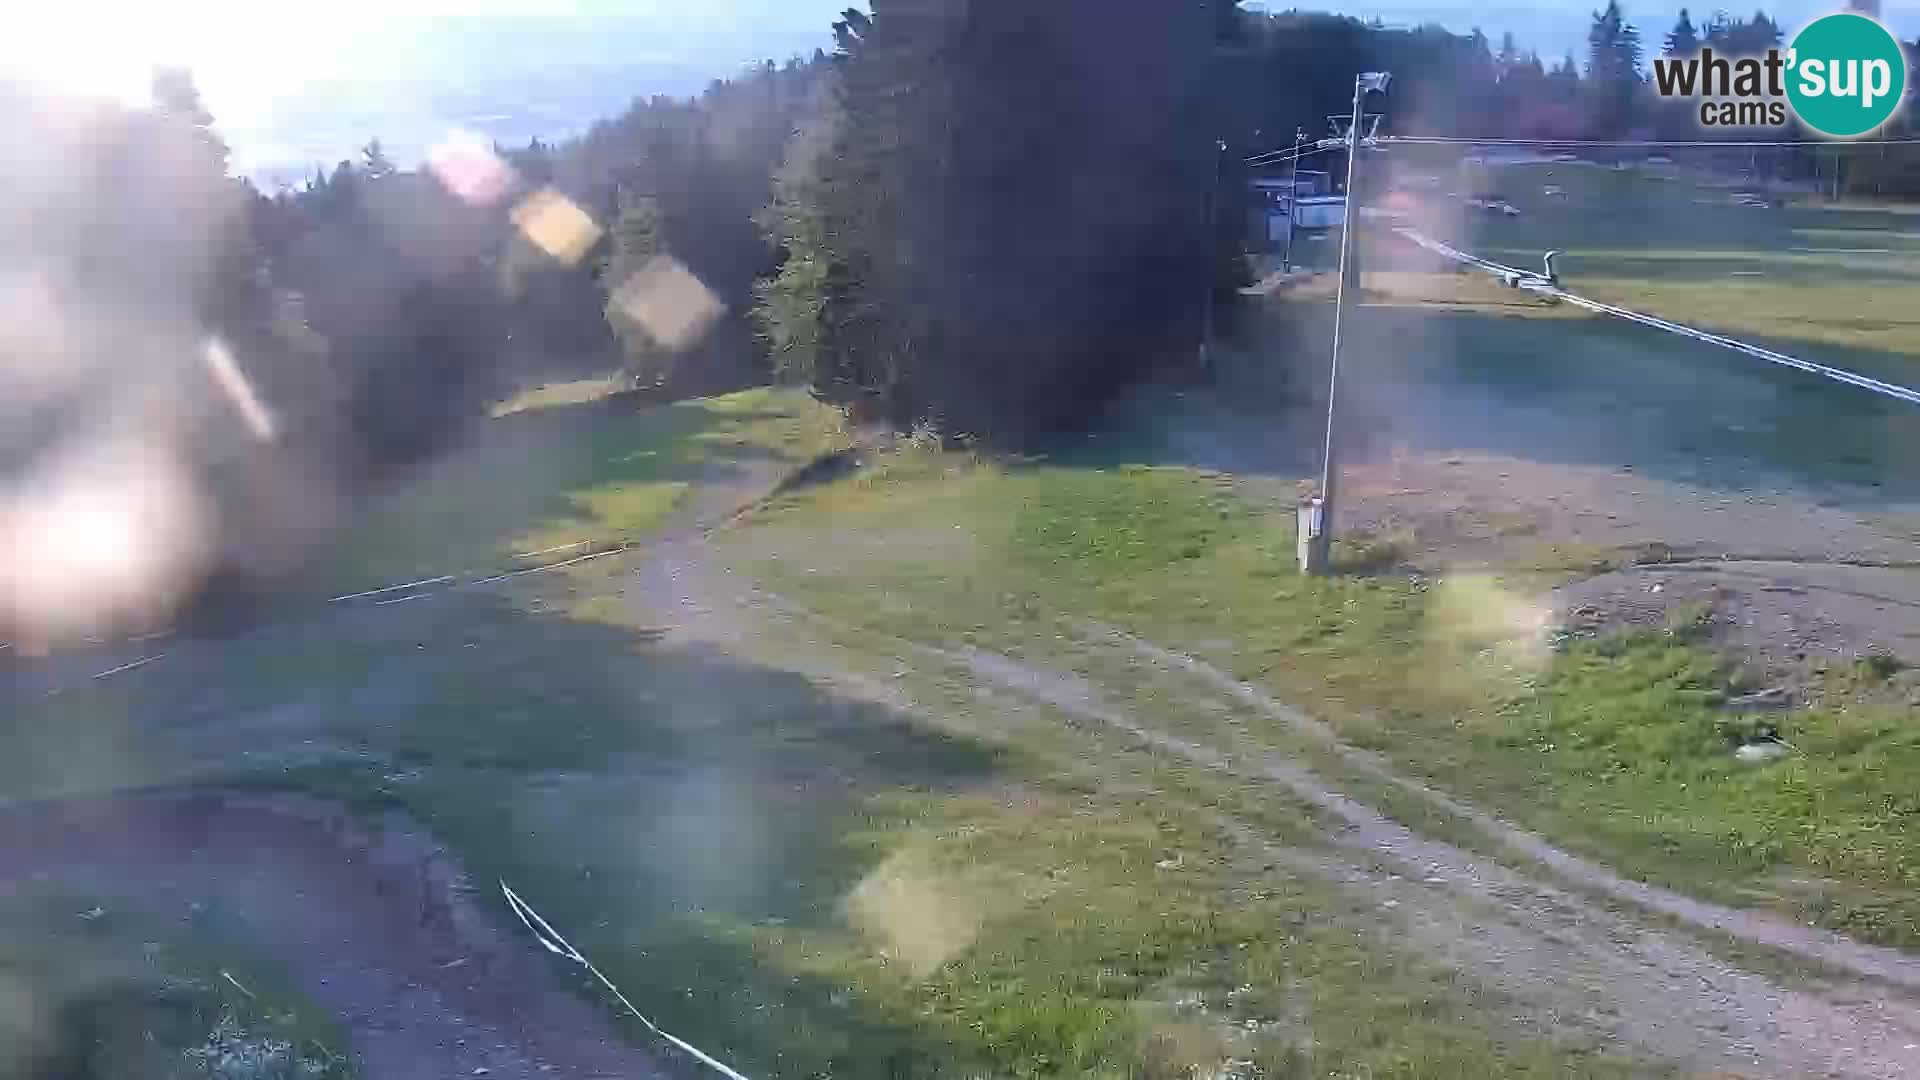 Livecam Skigebiet Maribor Pohorje – Bellevue